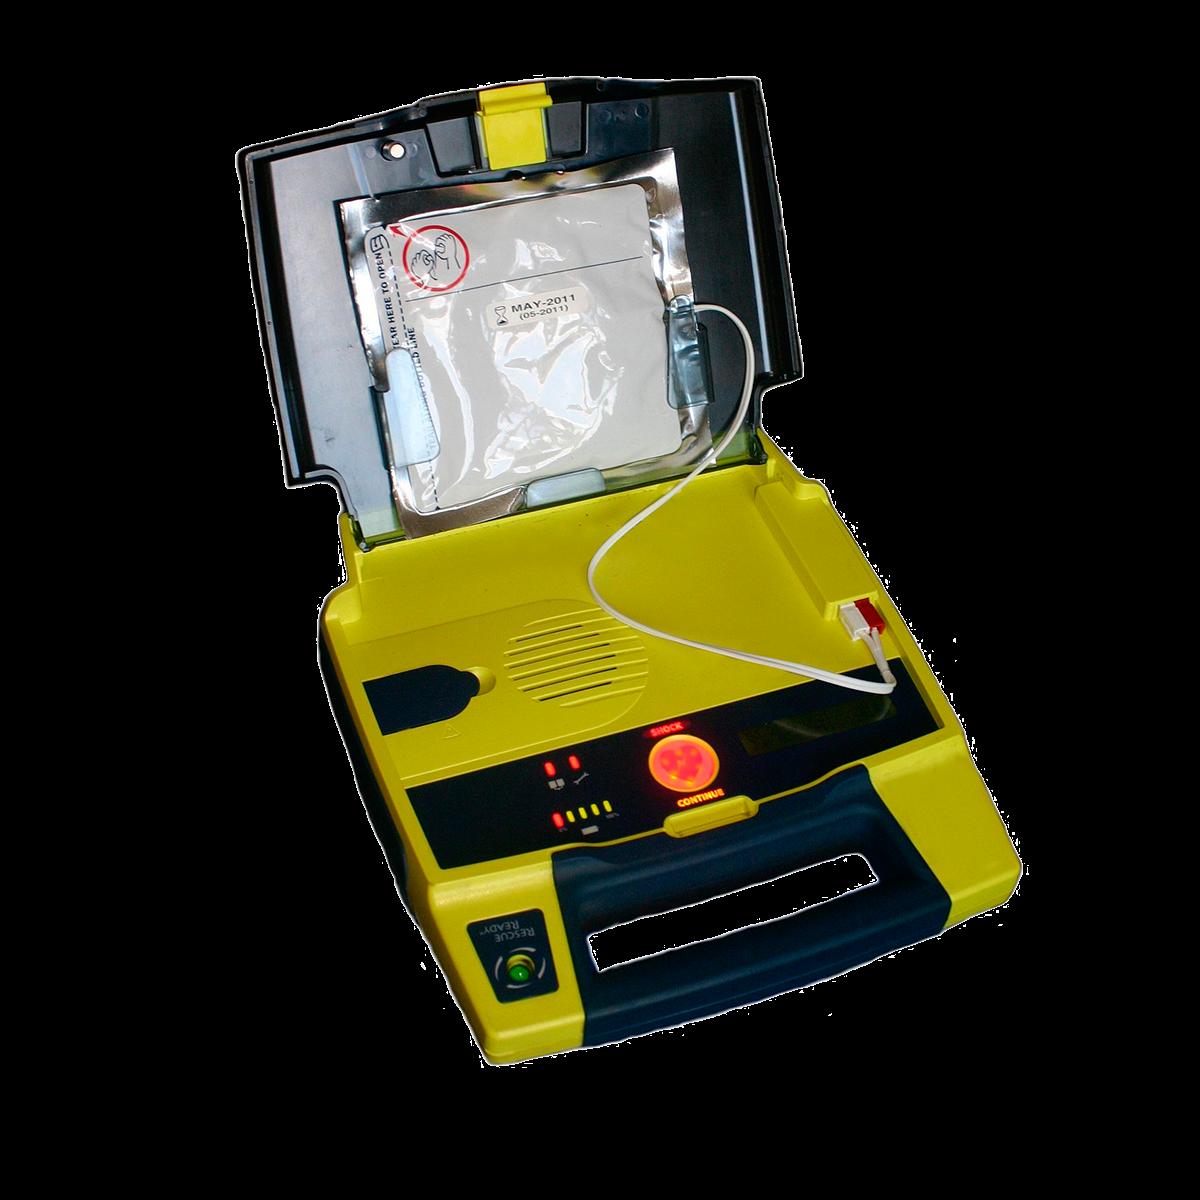 Training external defibrillators